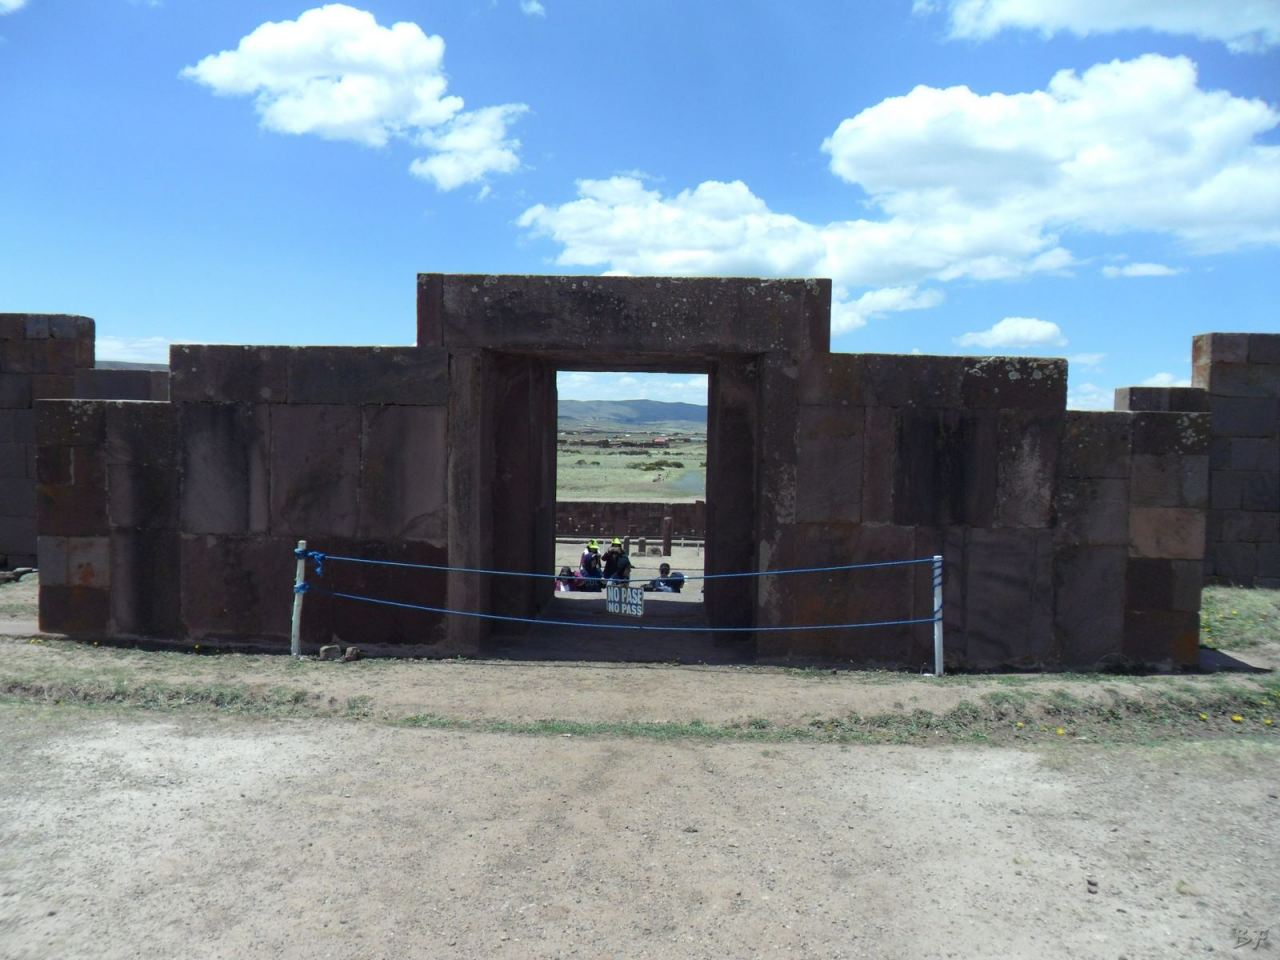 Sito-Megalitico-Piramide-Akapana-Kalasasaya-Menhir-Tiahuanaco-Bolivia-42